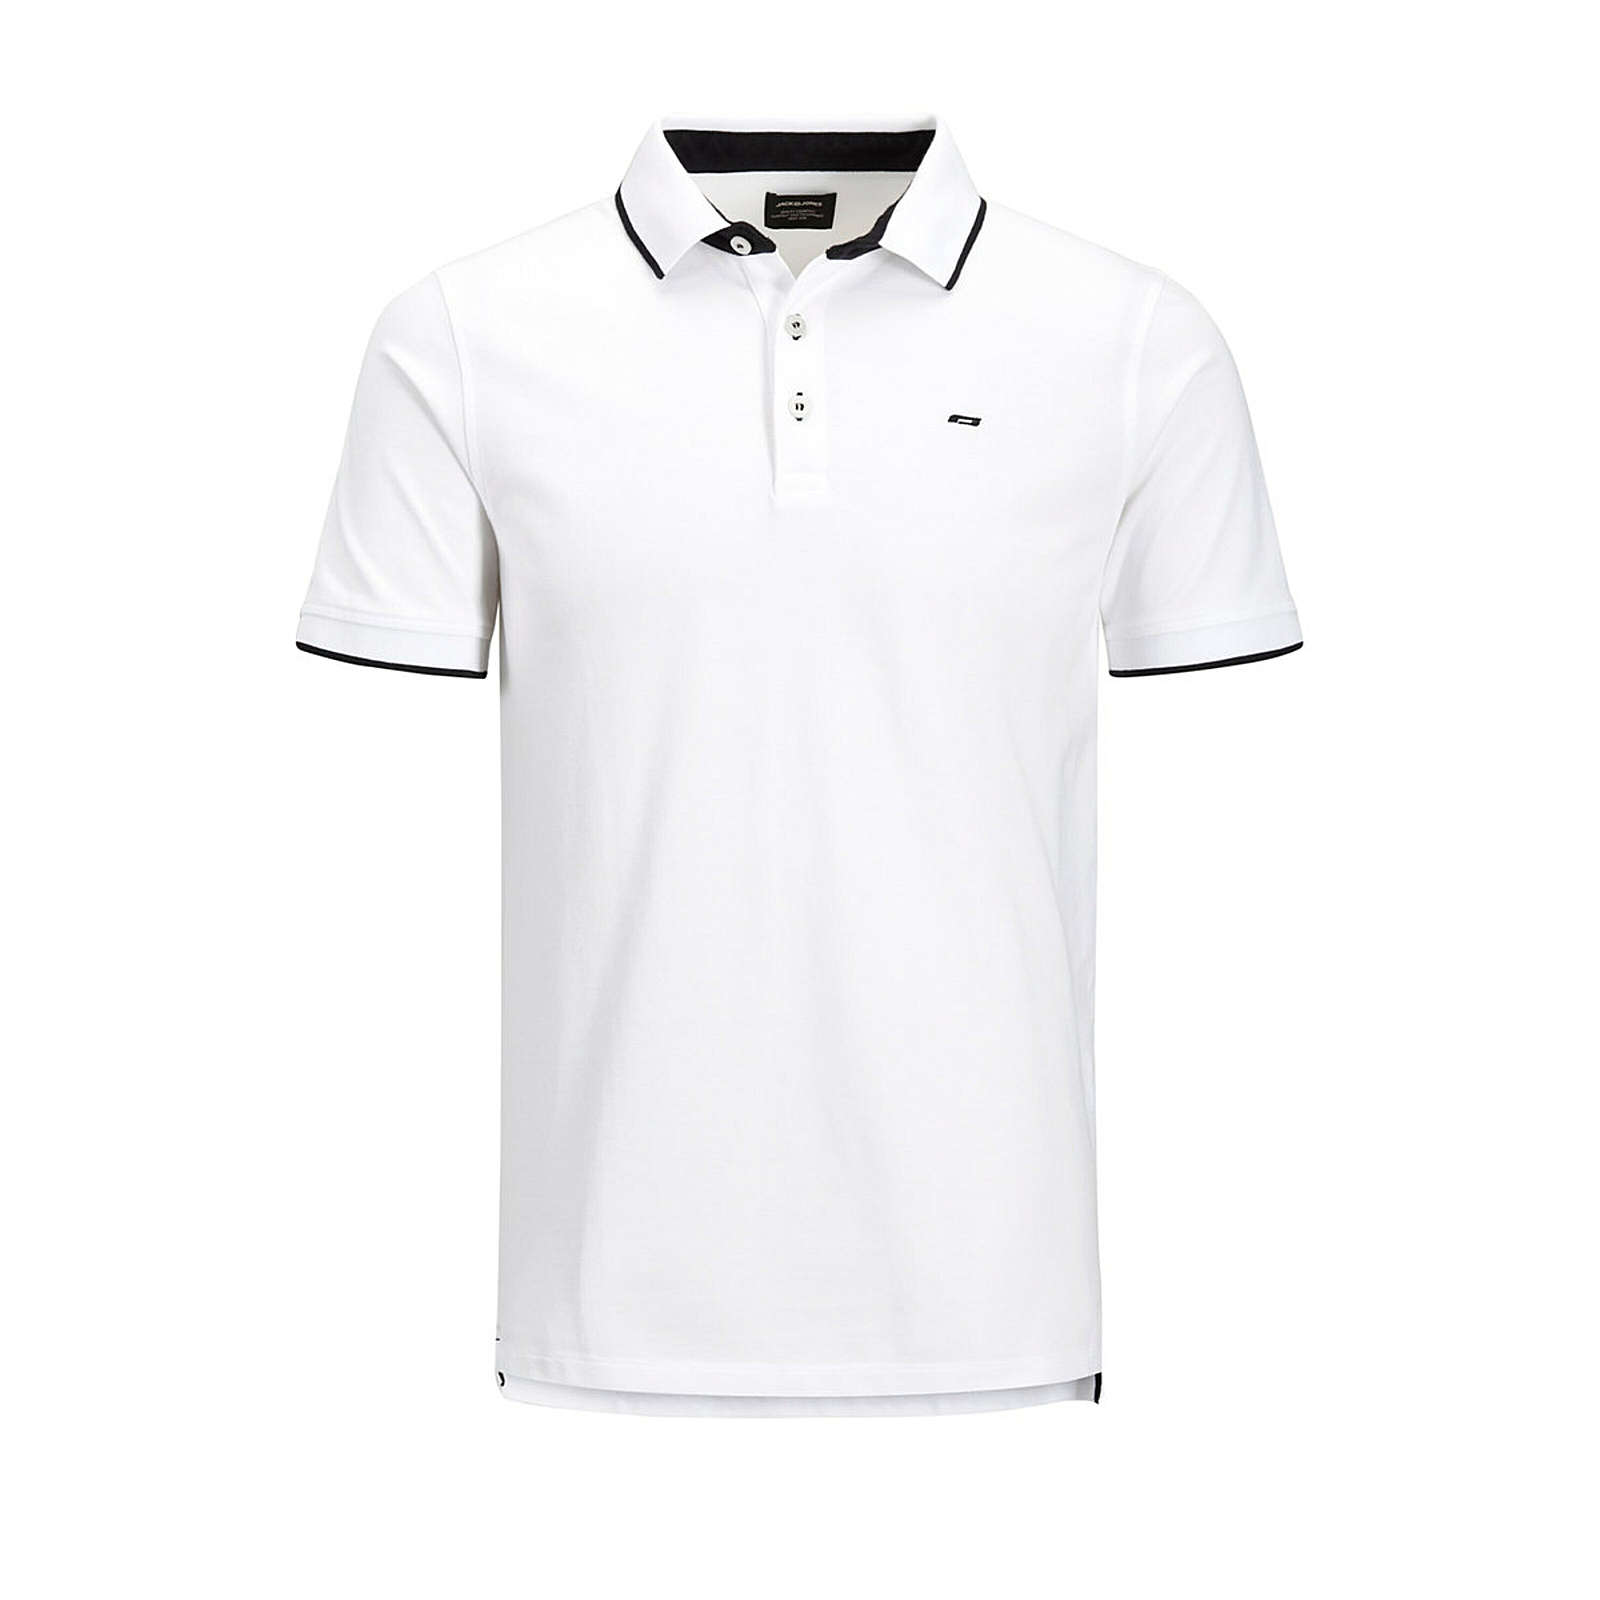 JACK & JONES Plus JACK & JONES PLUS shirt Poloshirts weiß Herren Gr. 50